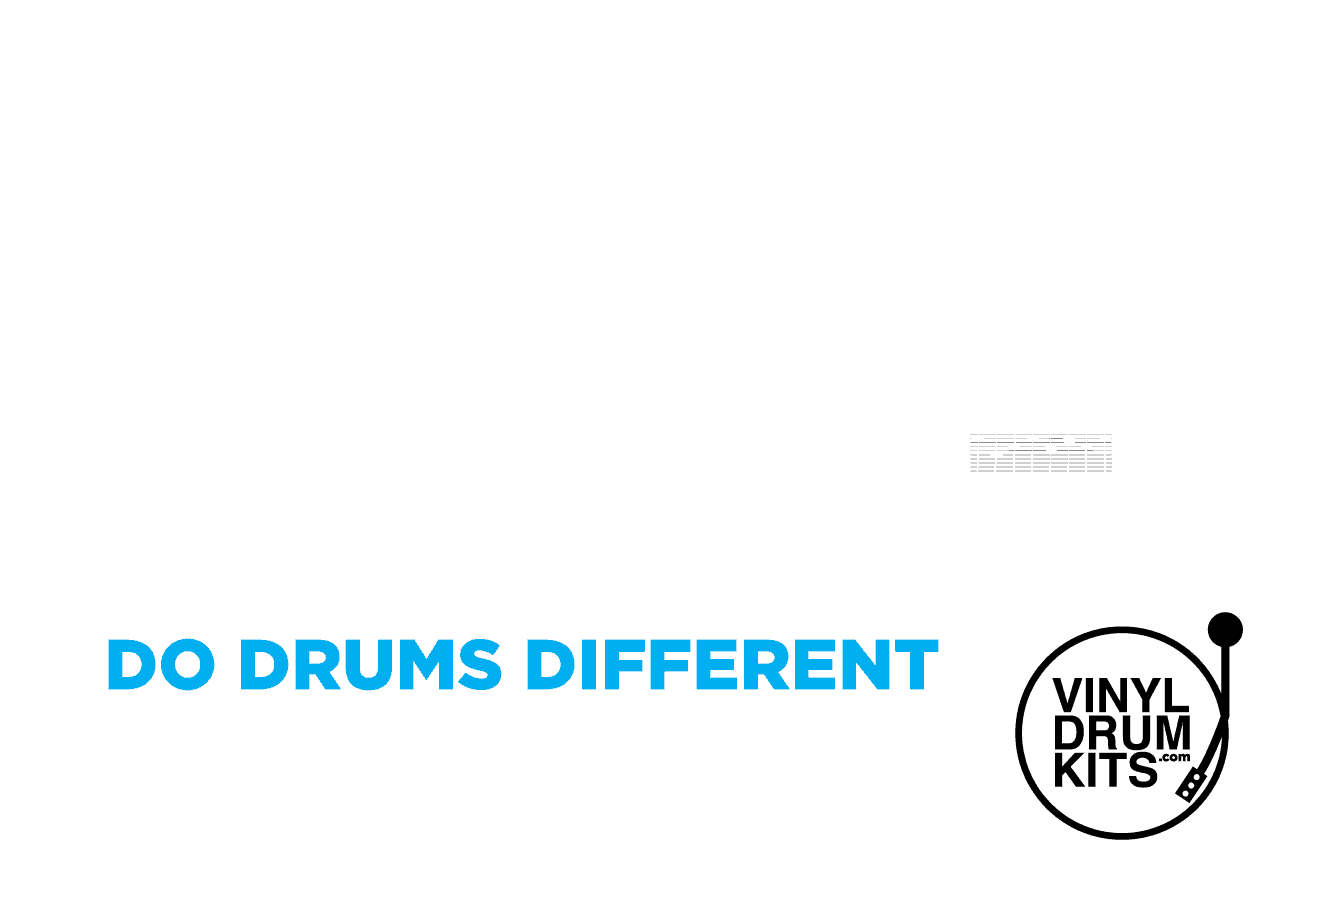 Vinyldrumkits Com Do Drums Different